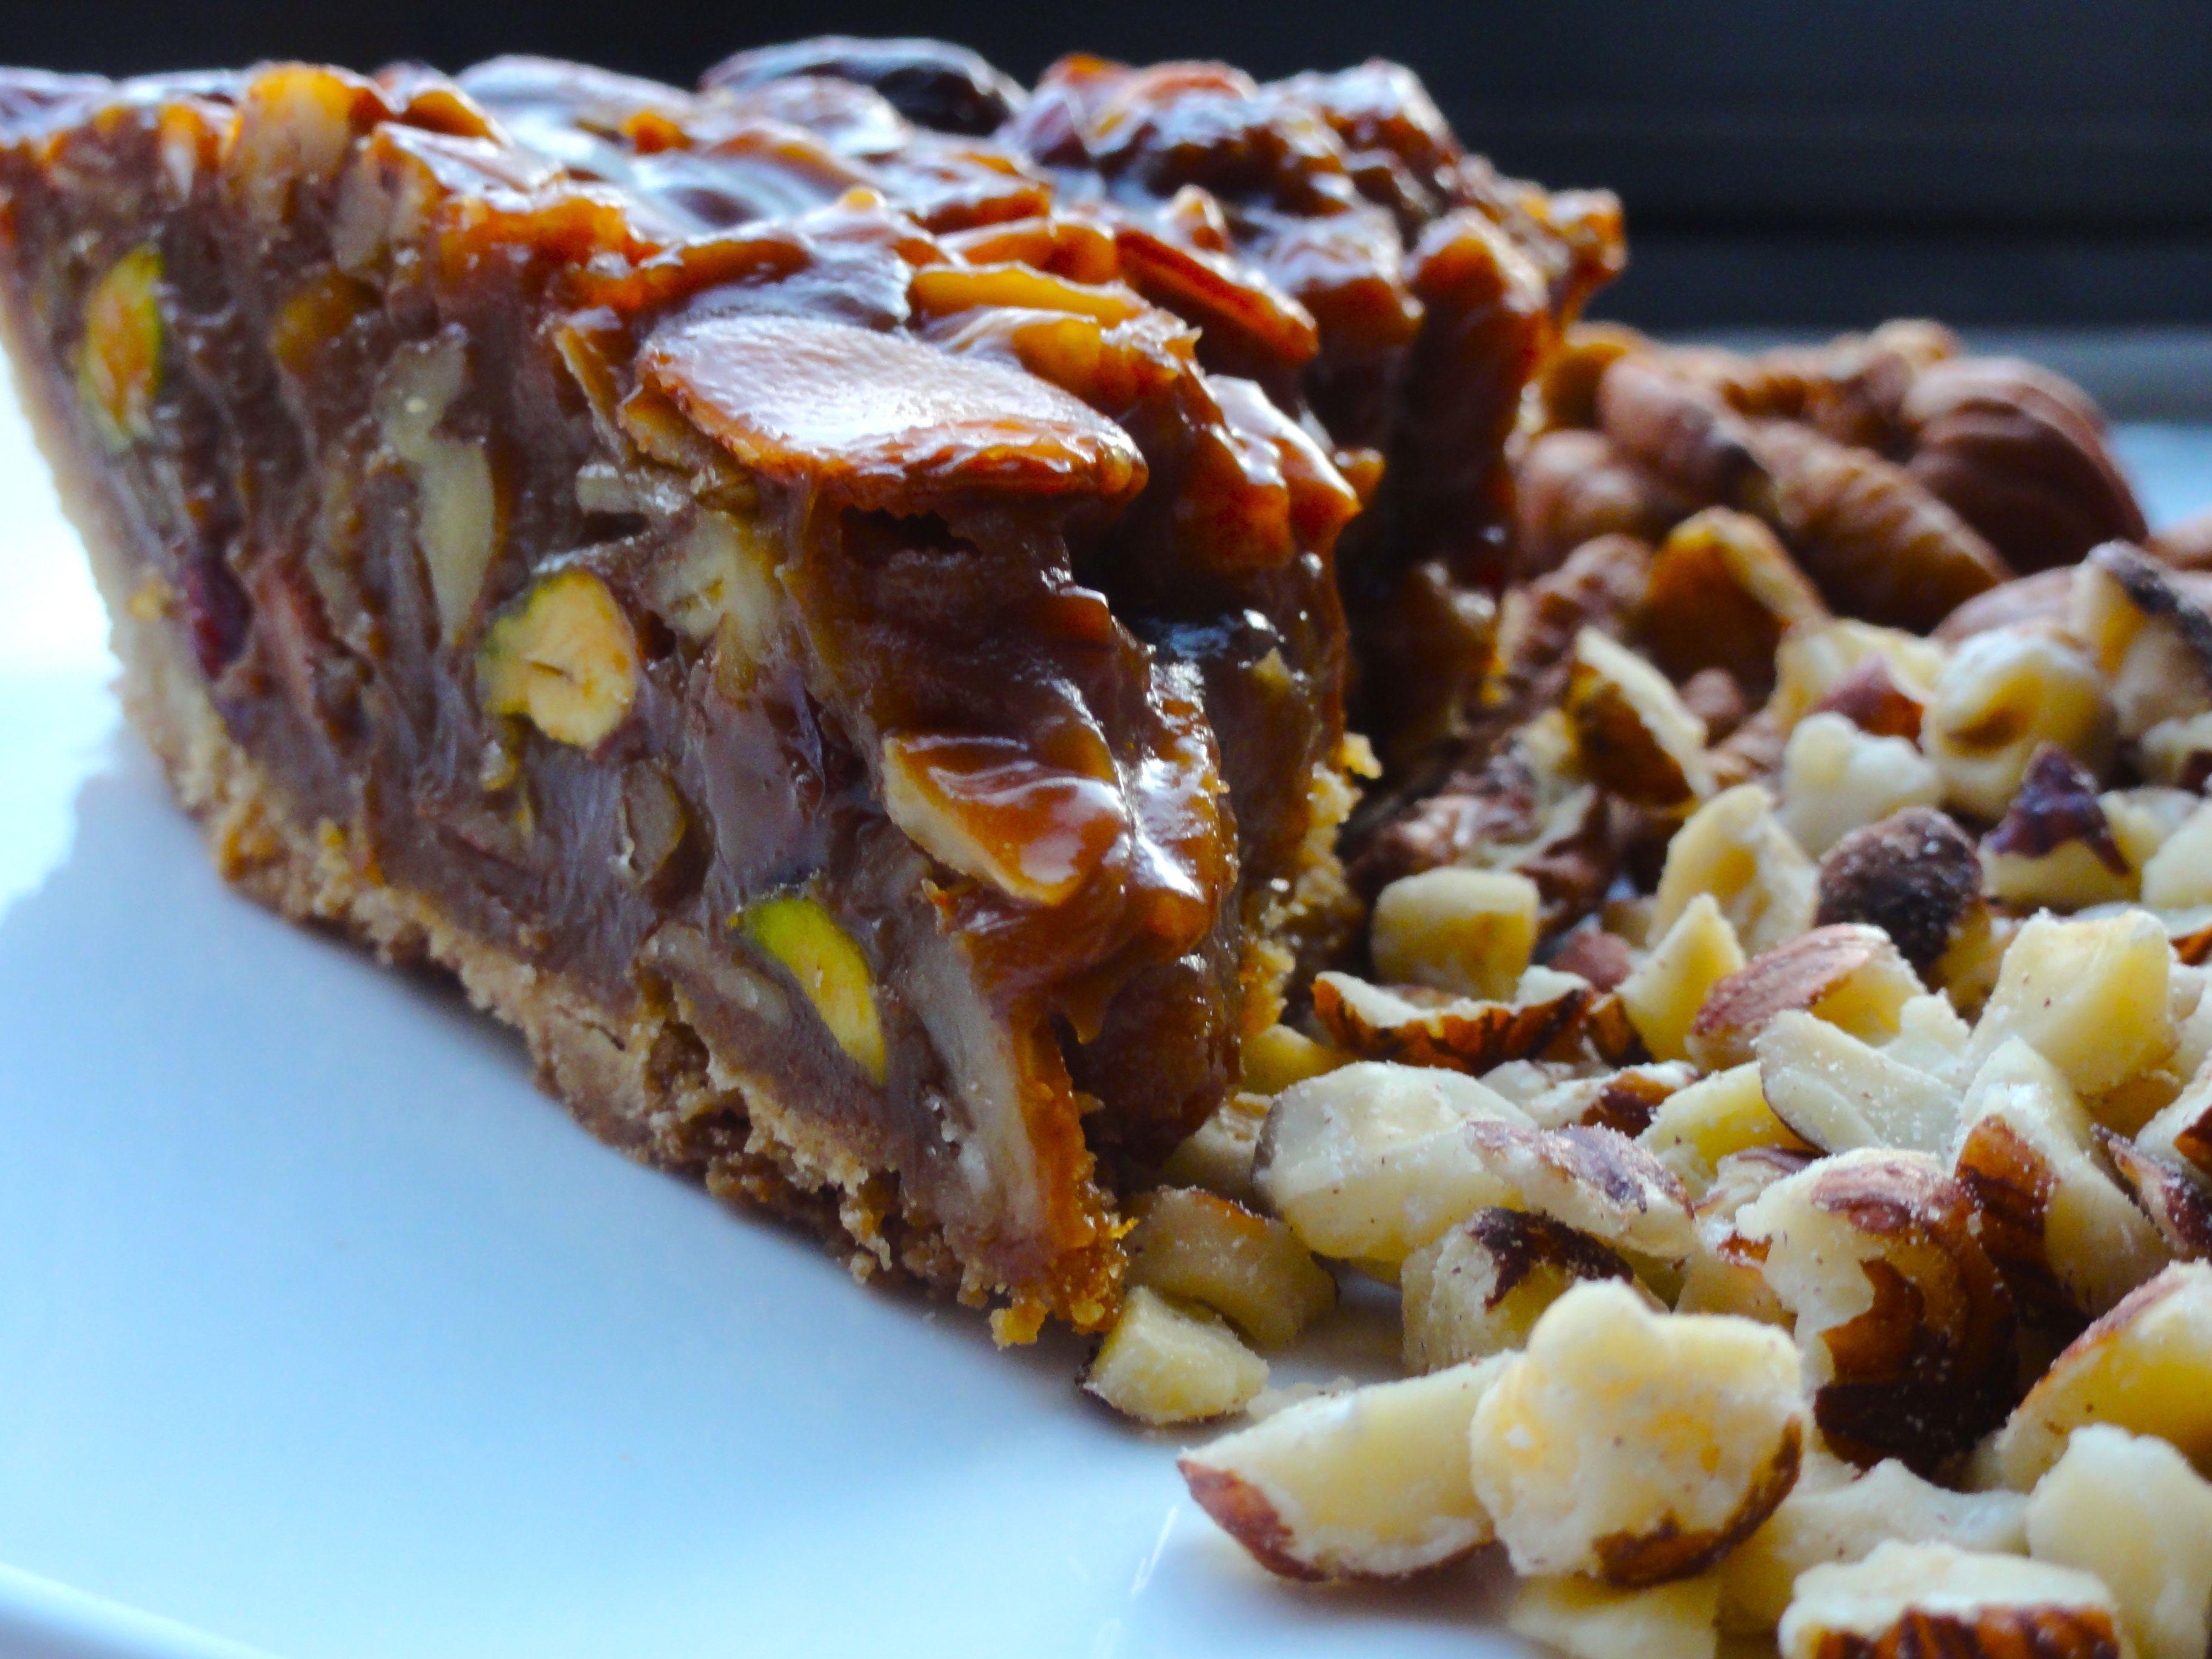 Ooey Gooey Caramel Nut Tart – Chef Priyanka